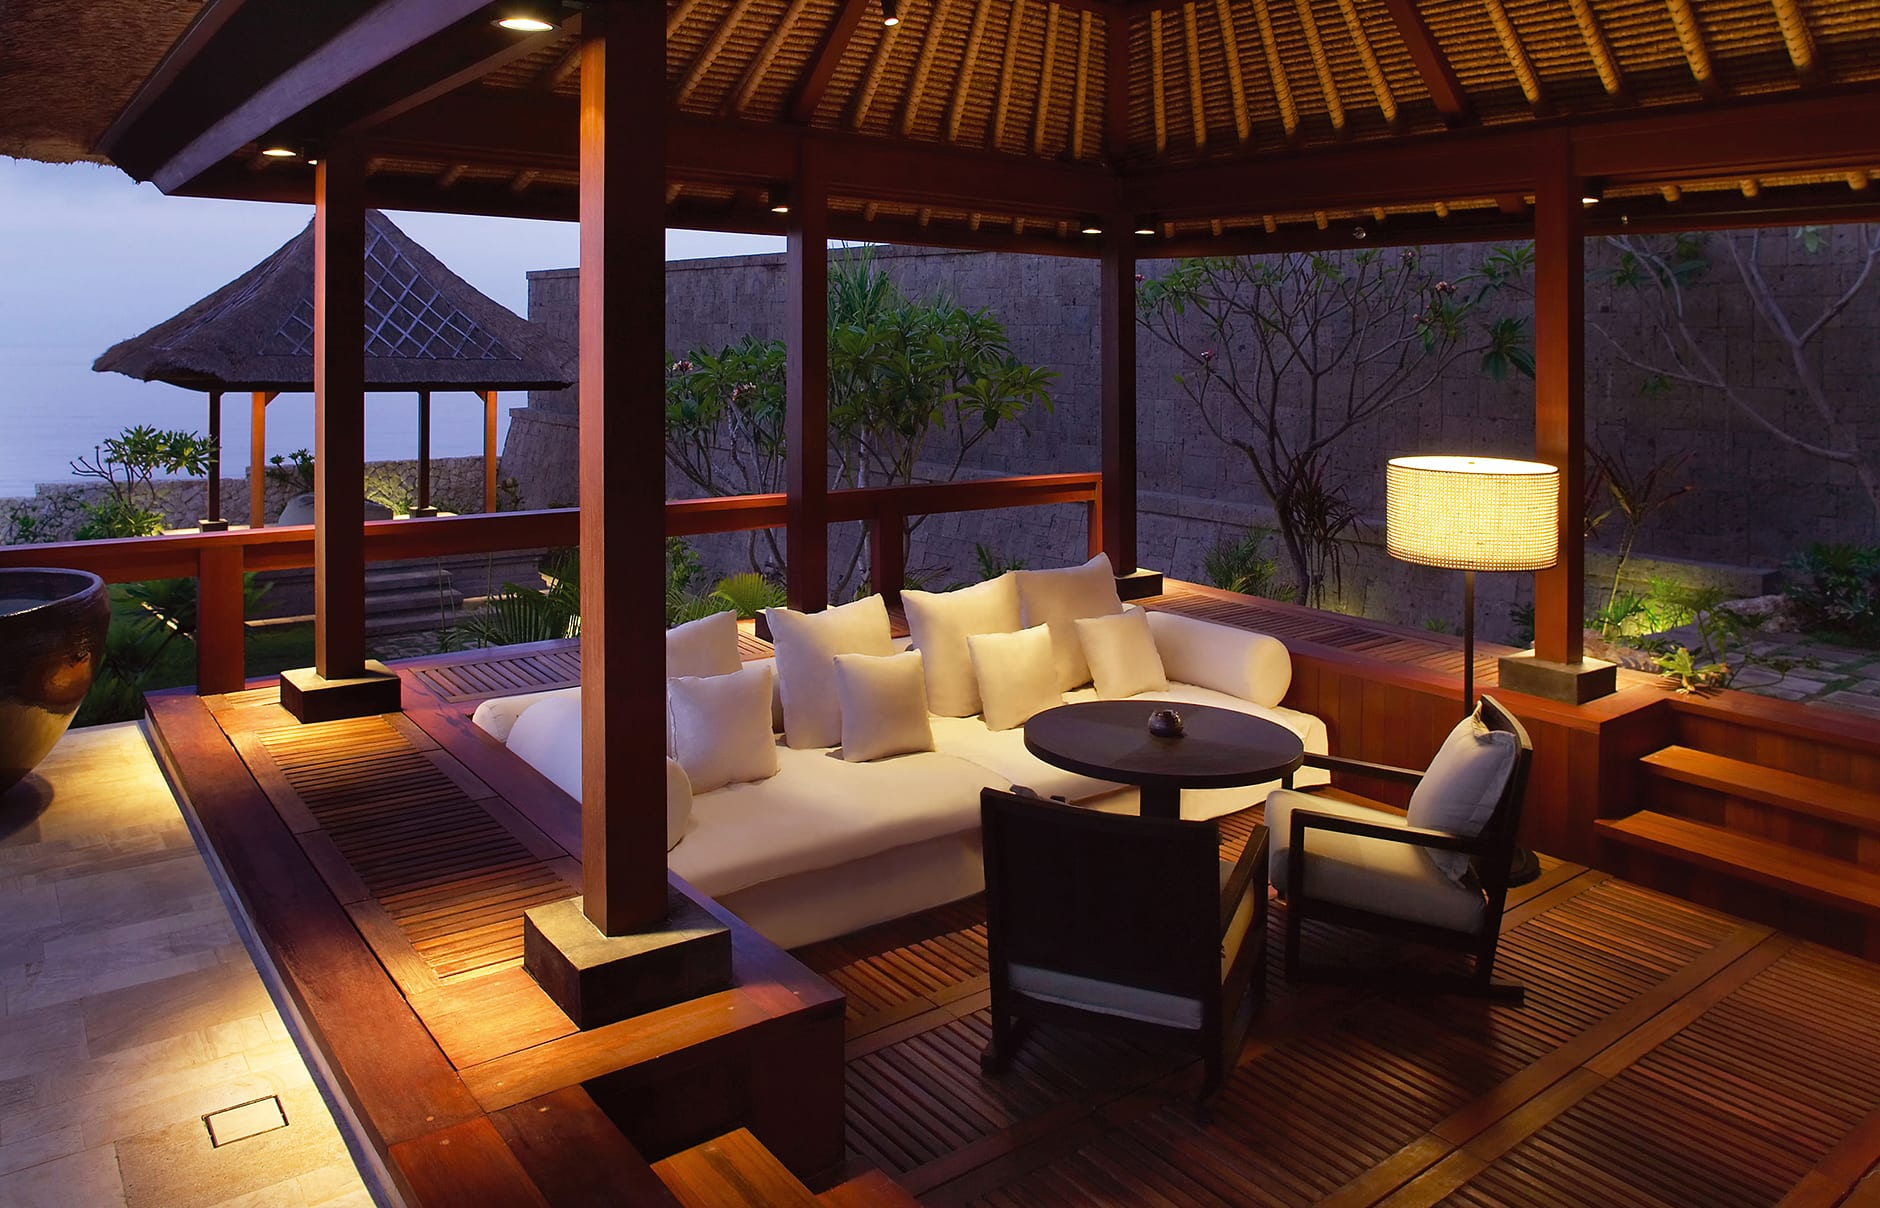 bulgari resort bali « luxury hotels travelplusstyle